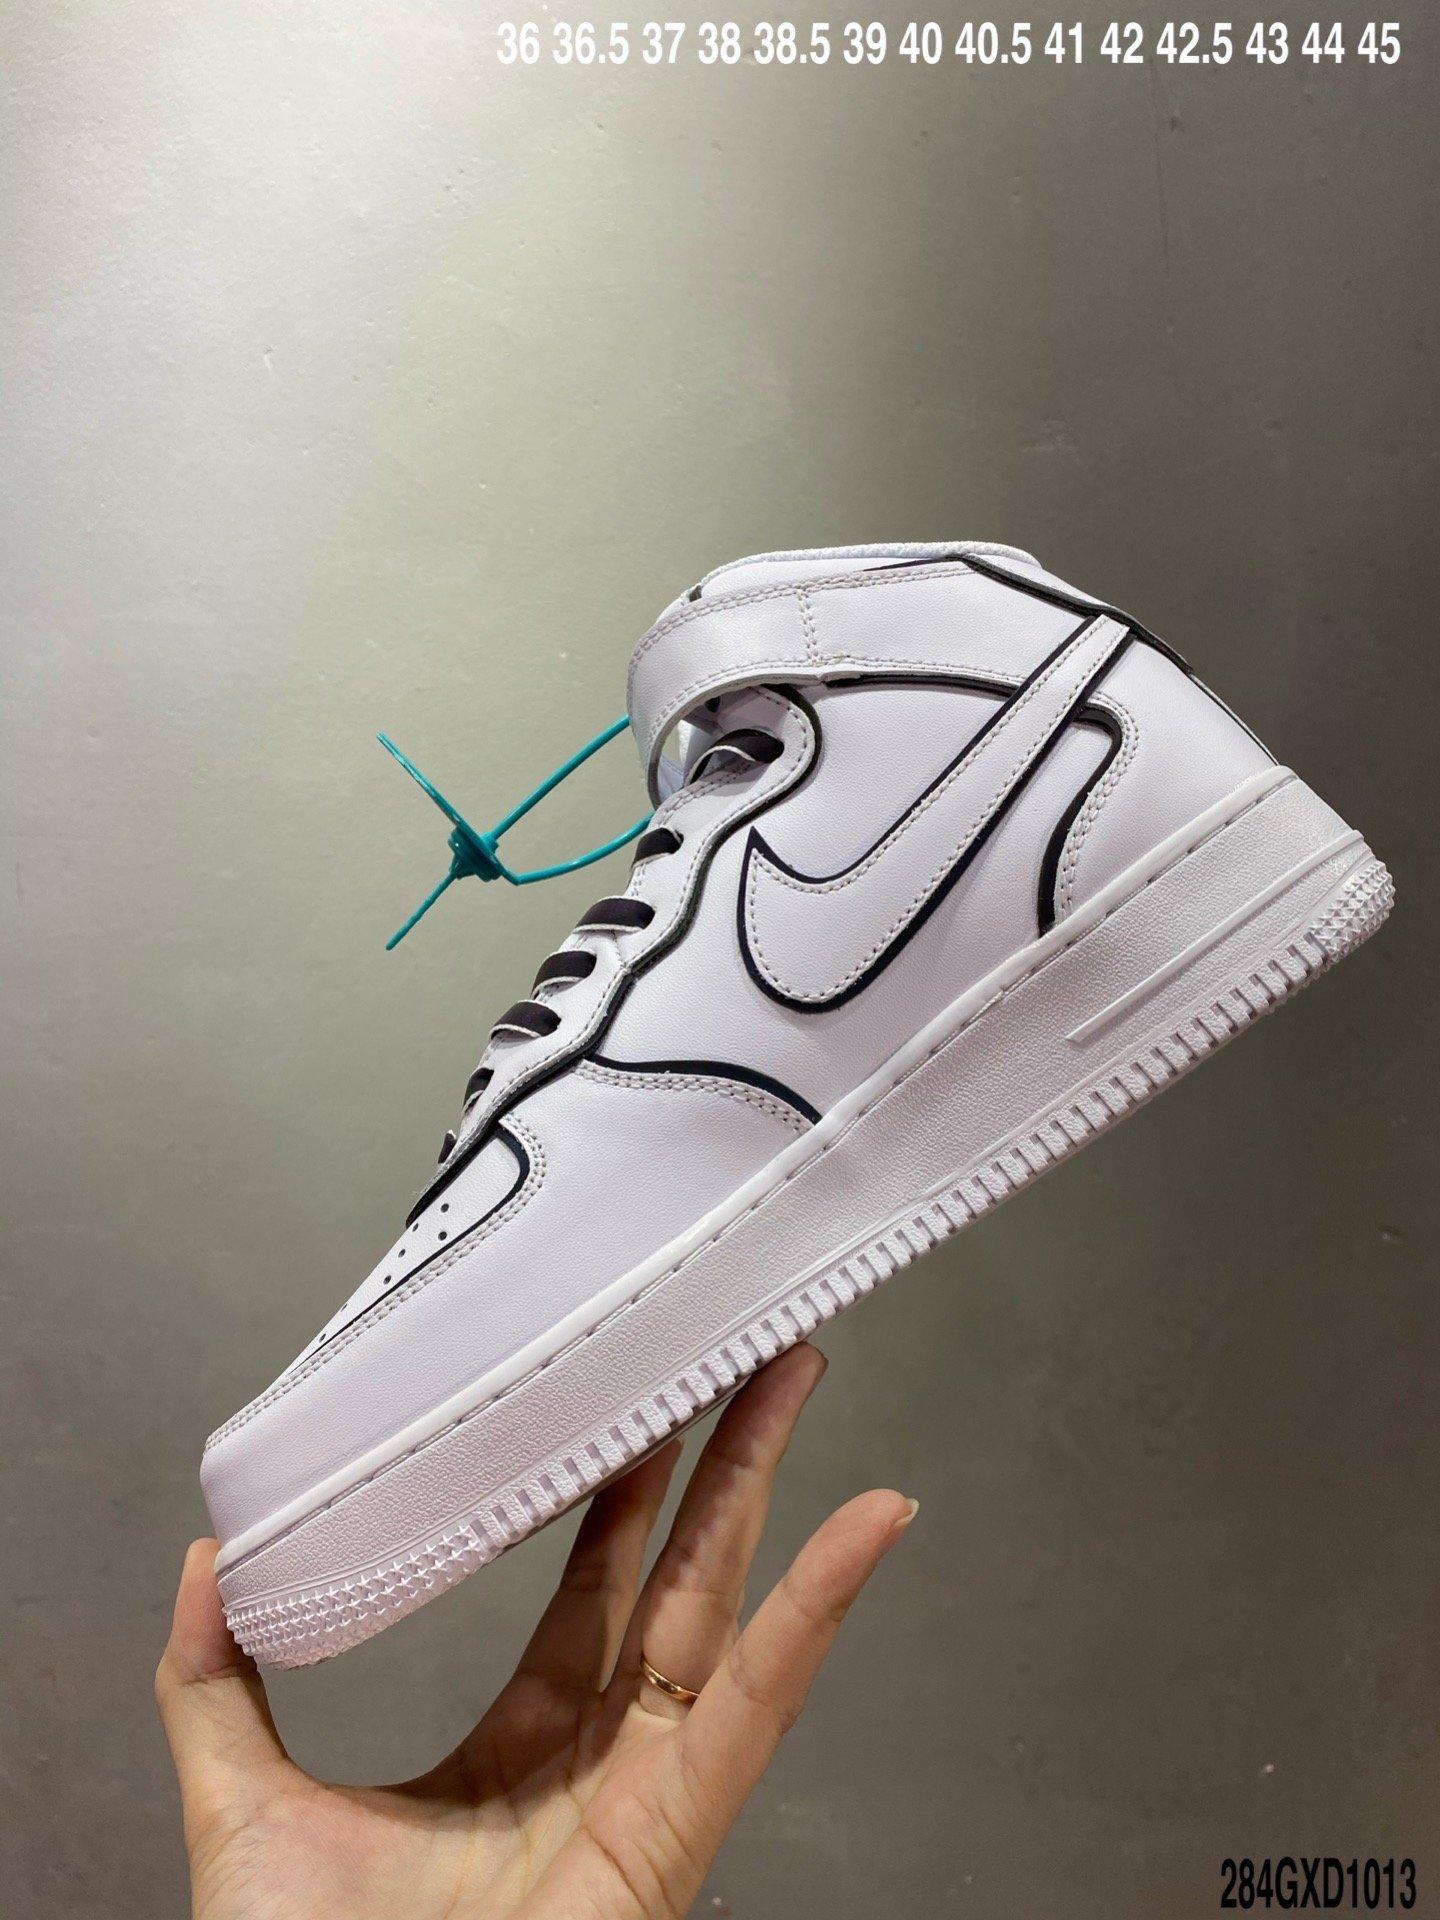 运动板鞋, 空军一号, 板鞋, Nike Air Force 1, Nike Air, Air Force 1, 3M反光